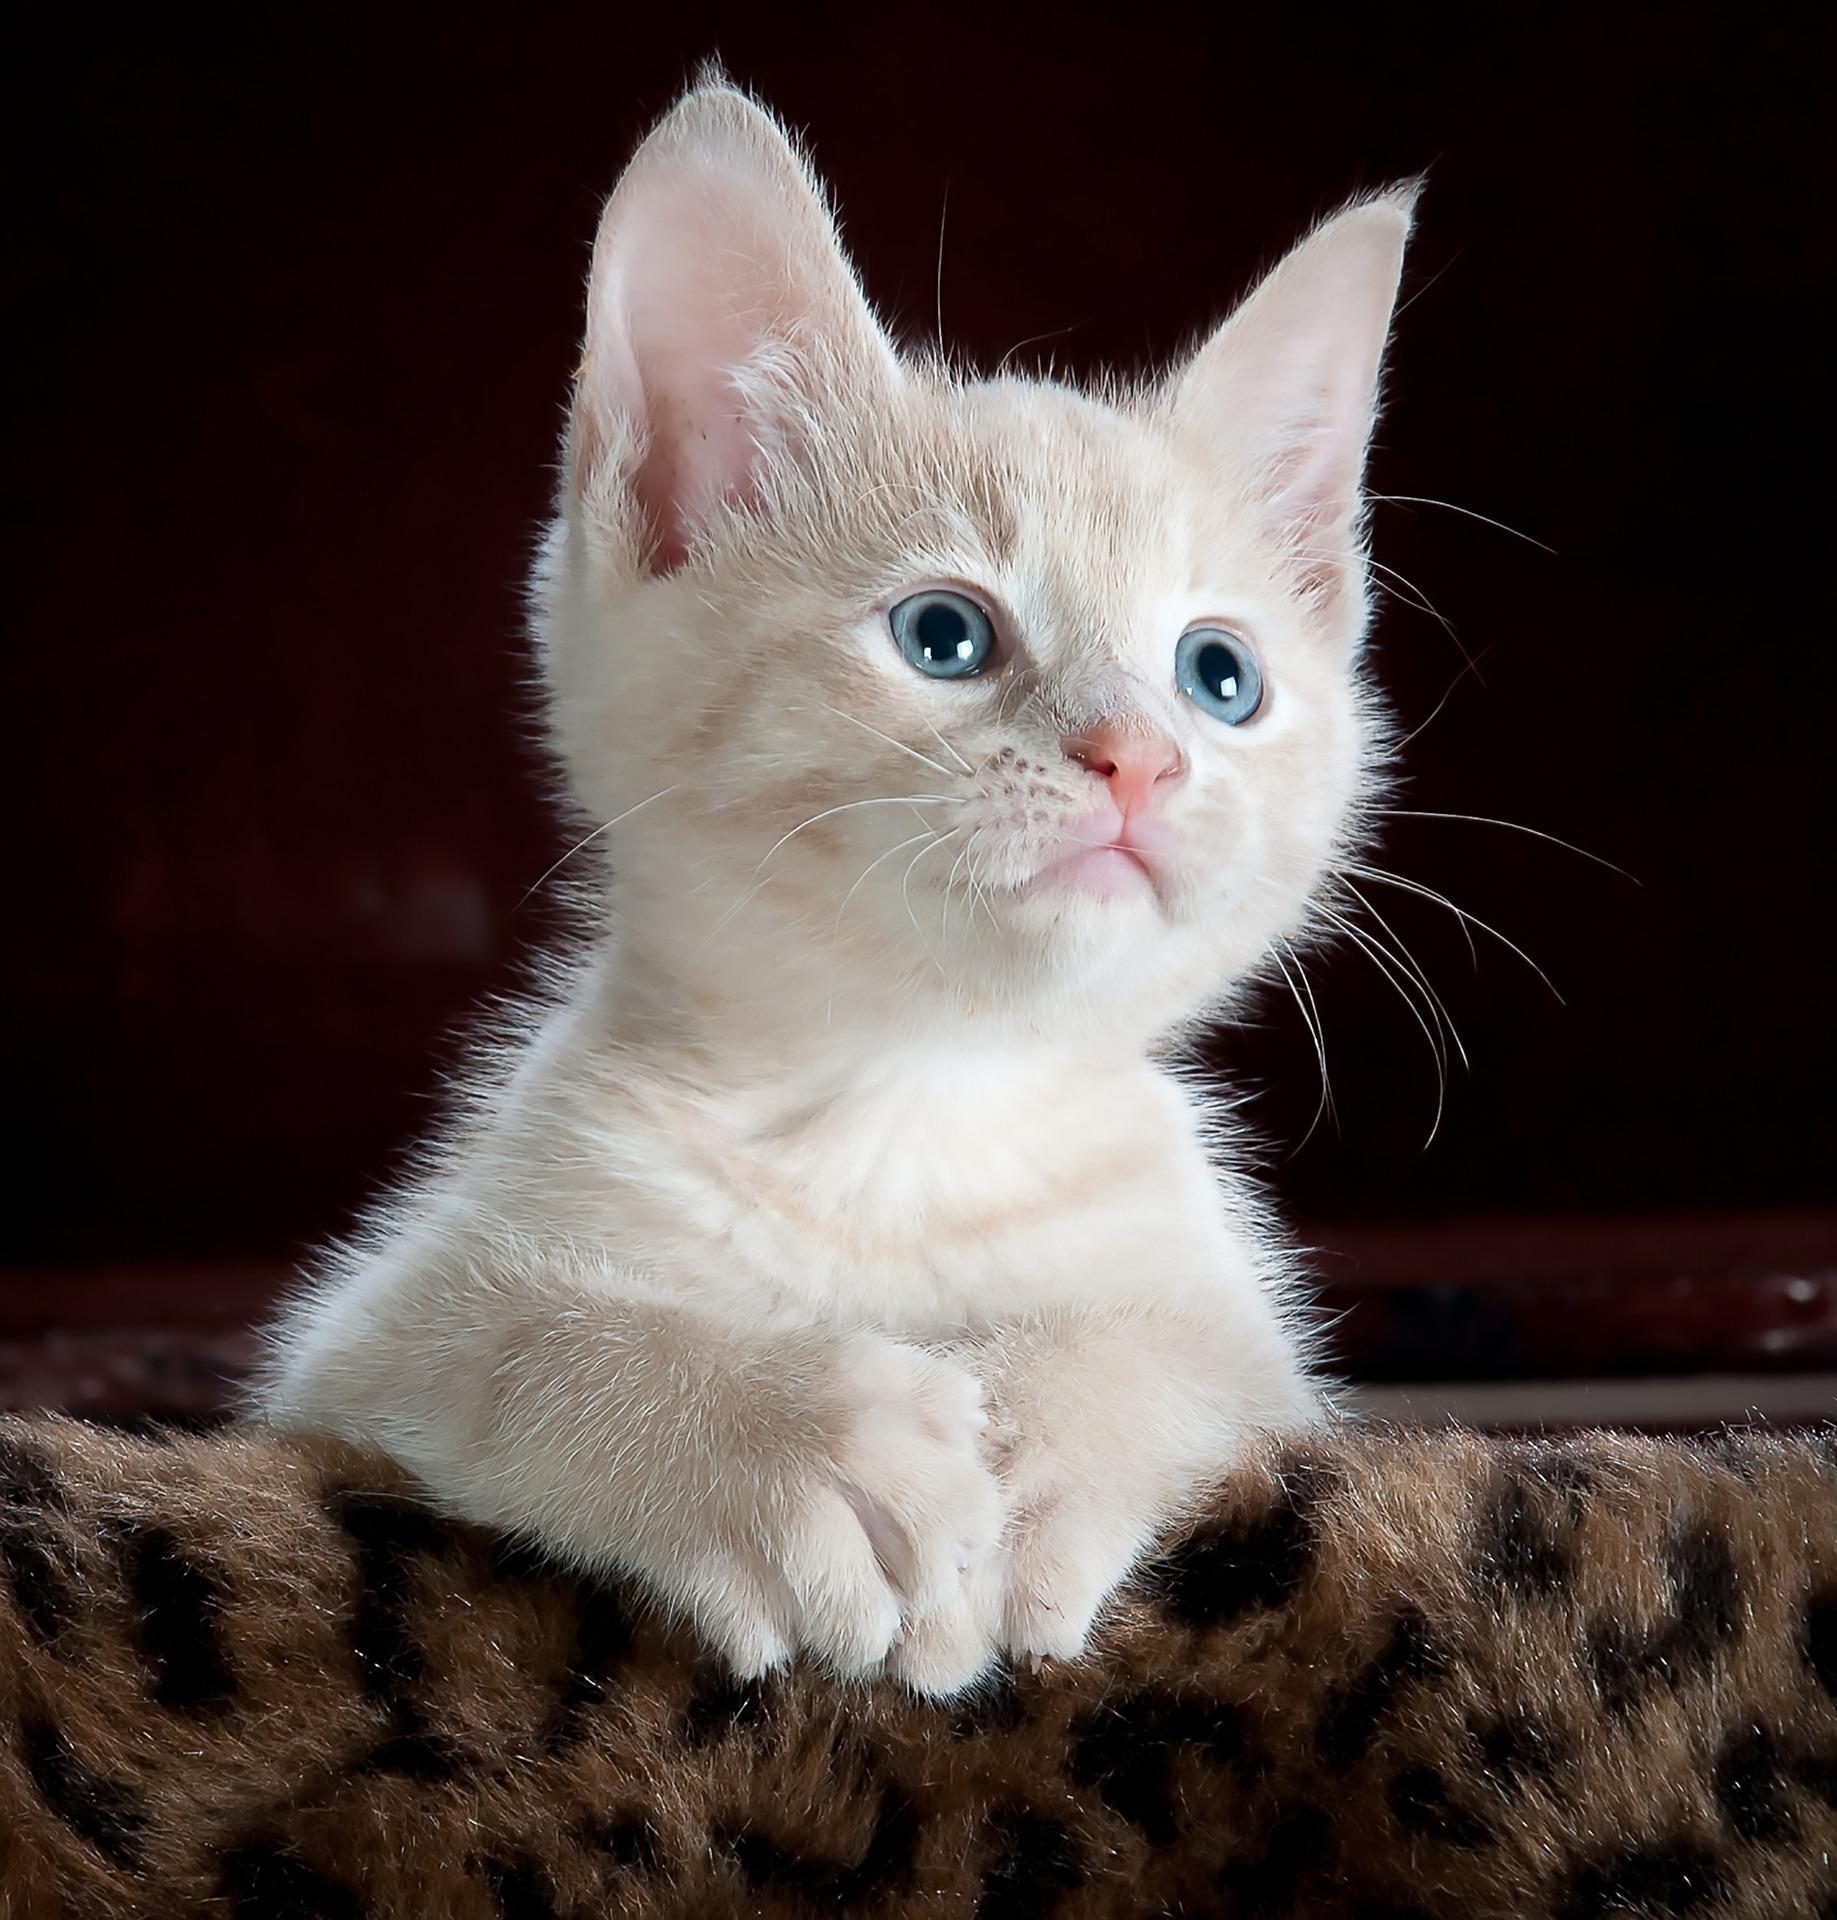 NAIL TRIM CAT - Cat & Small Animal Nail Trim Form